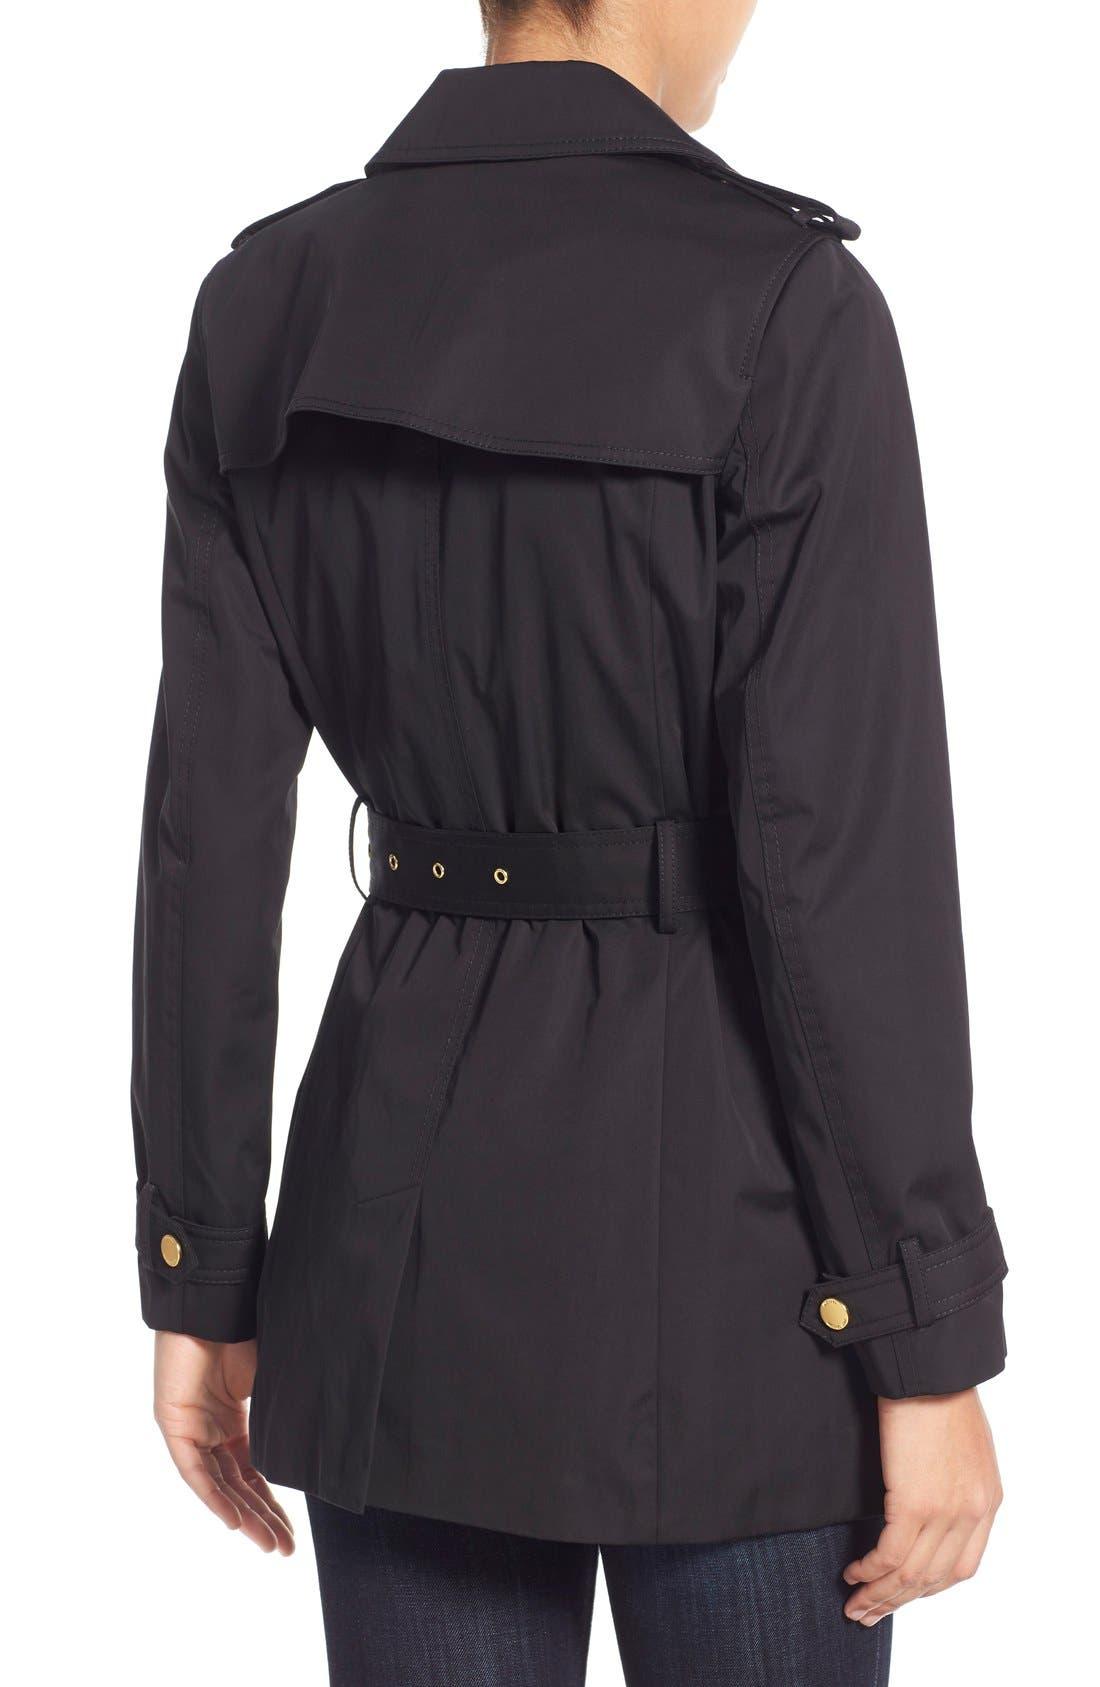 MICHAEL MICHAEL KORS,                             Asymmetrical Zip Sateen Trench Coat,                             Alternate thumbnail 4, color,                             001